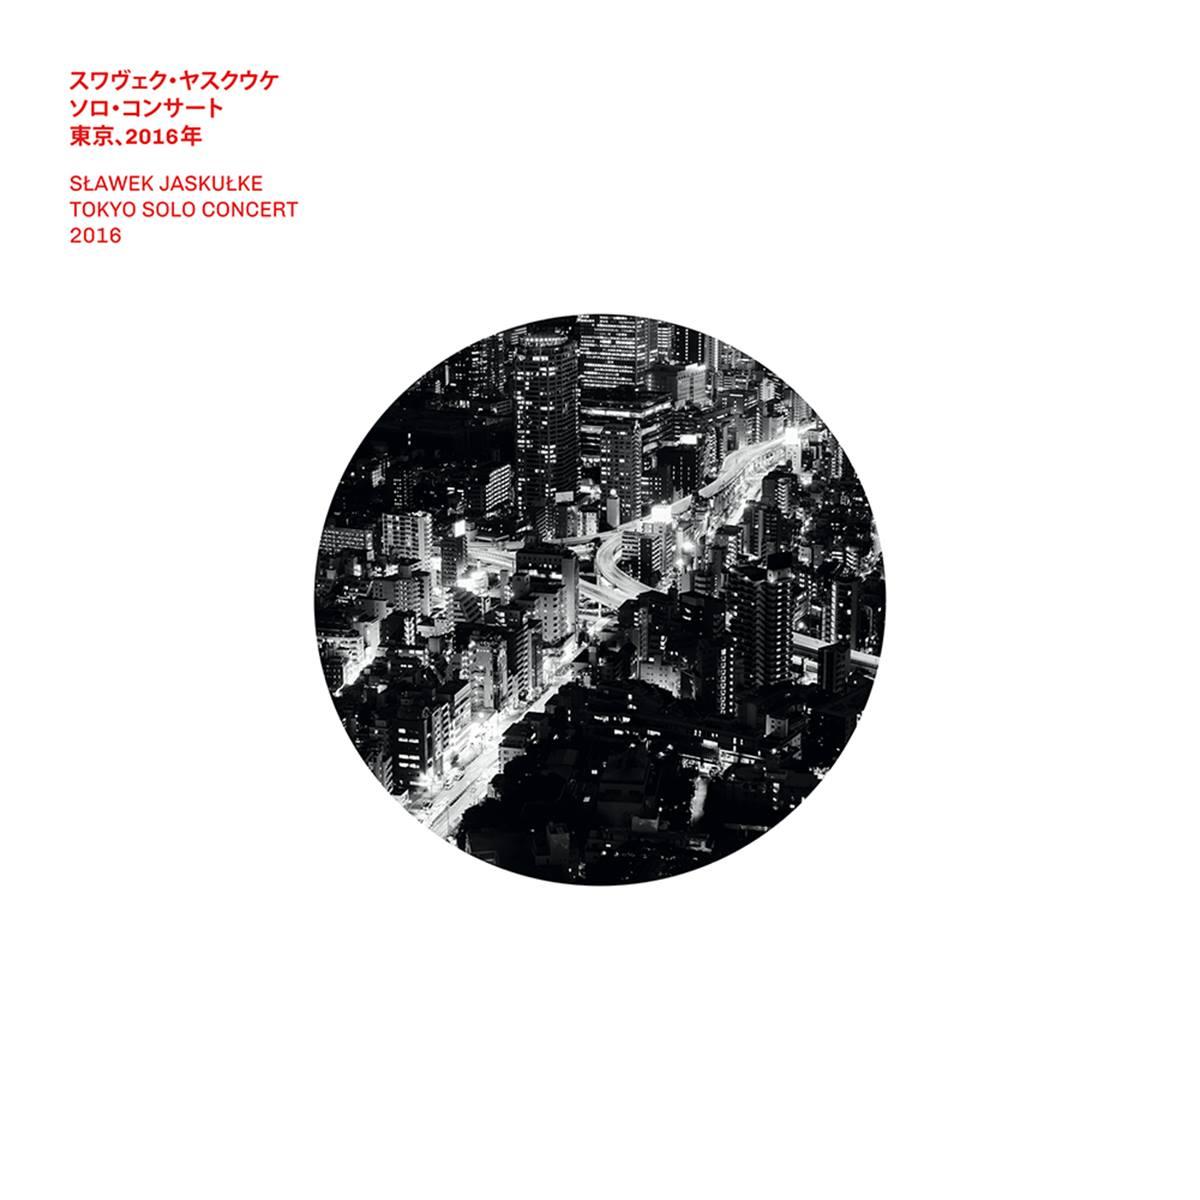 SLAWEK JASKULKE – TOKYO SOLO CONCERT 2016